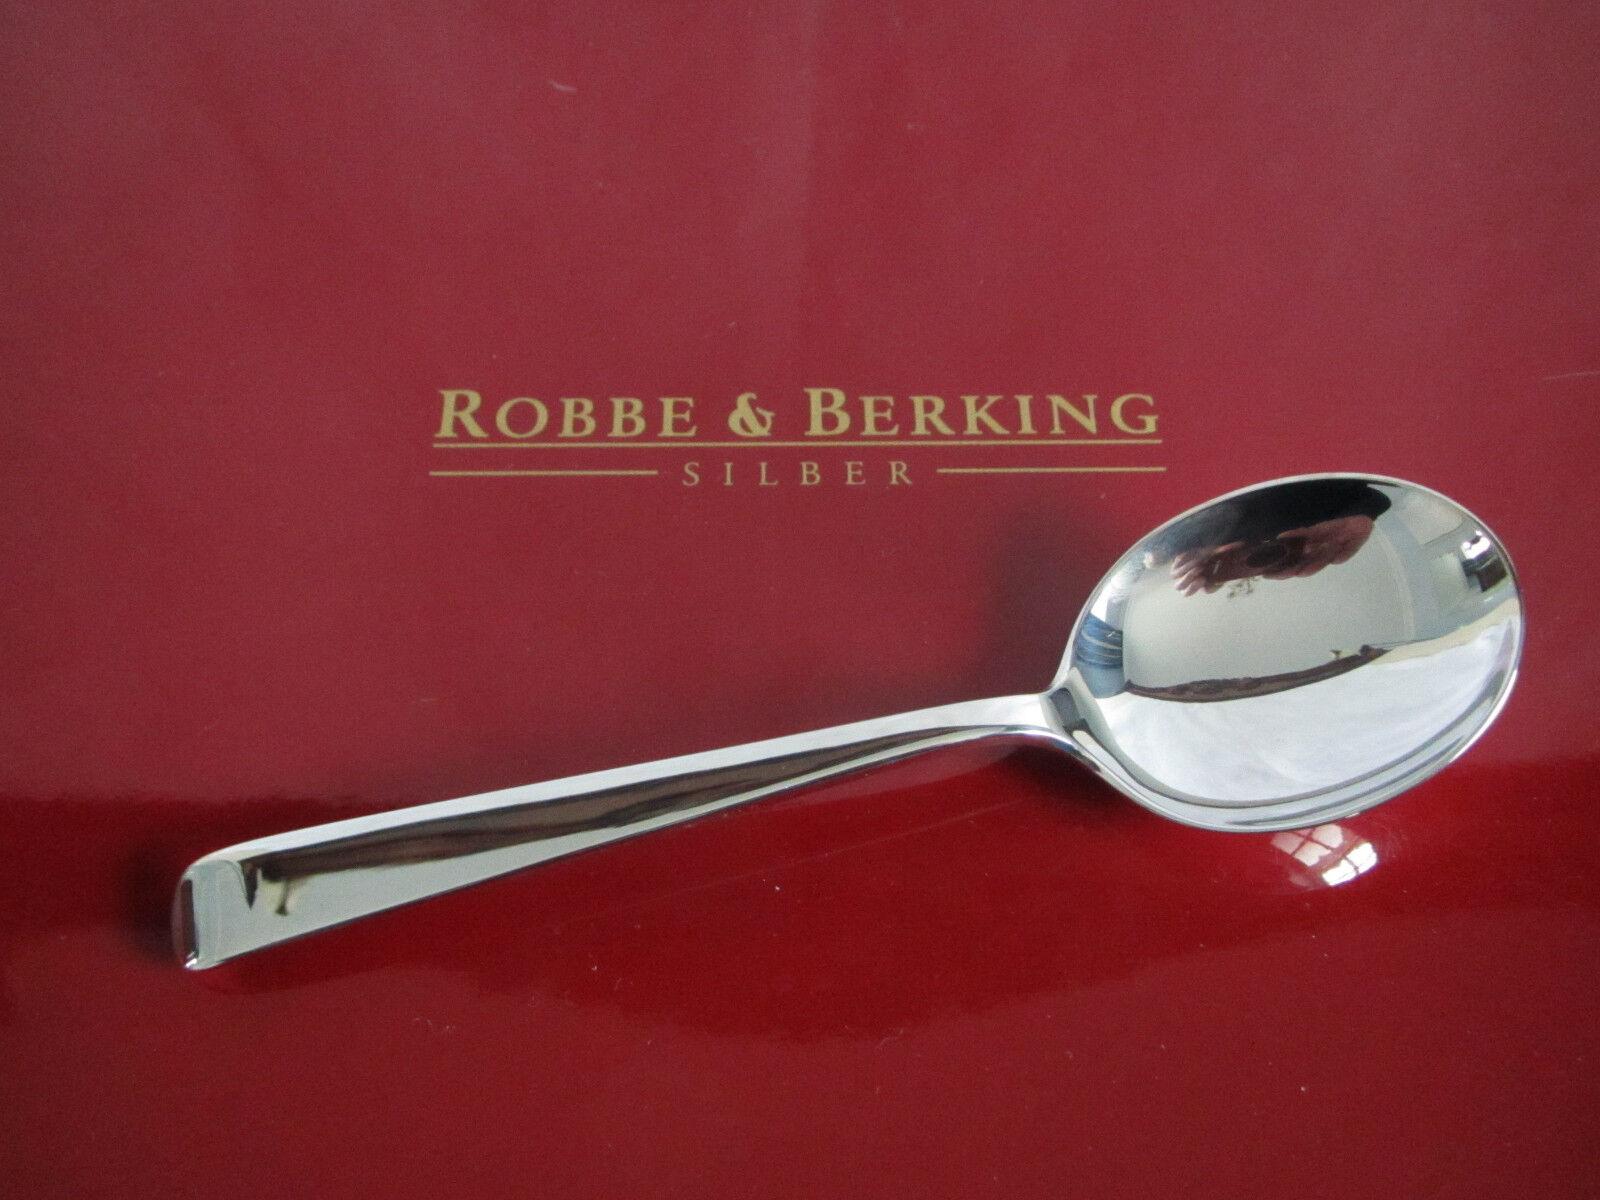 Robbe & Berking Tassenlöffel Tassenlöffel Tassenlöffel  ALTA 925er Sterling Silber | Moderner Modus  d959e1